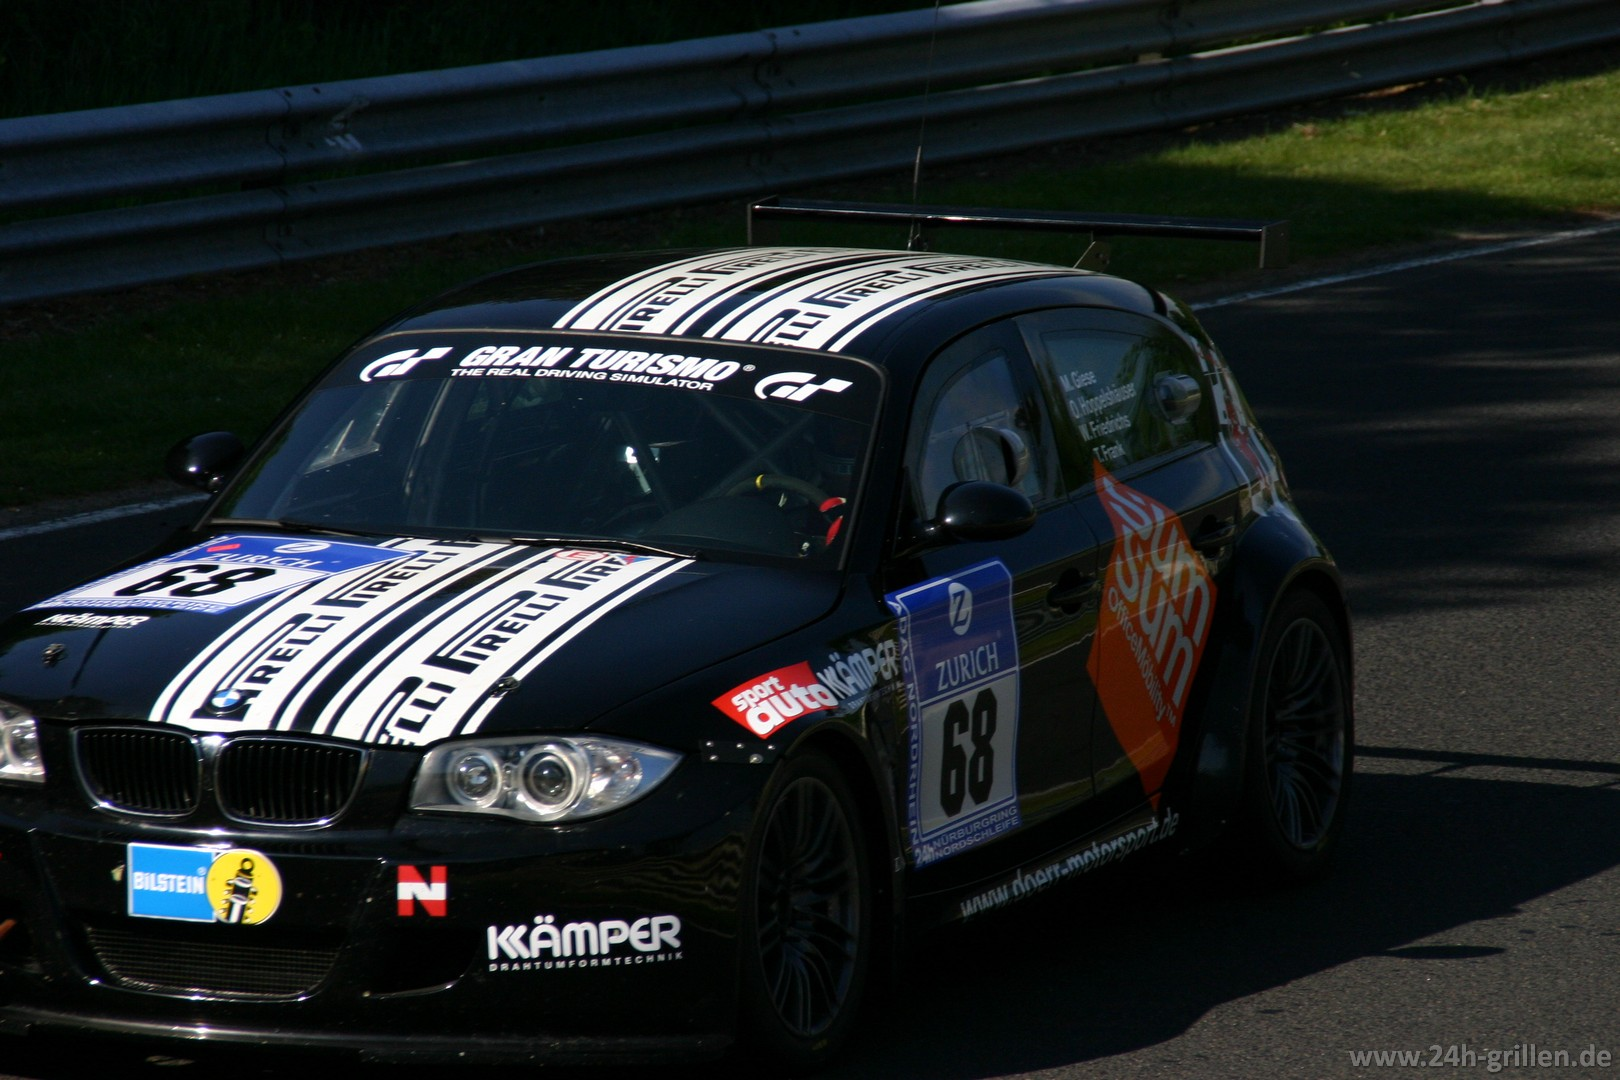 IMG_2008 (246)